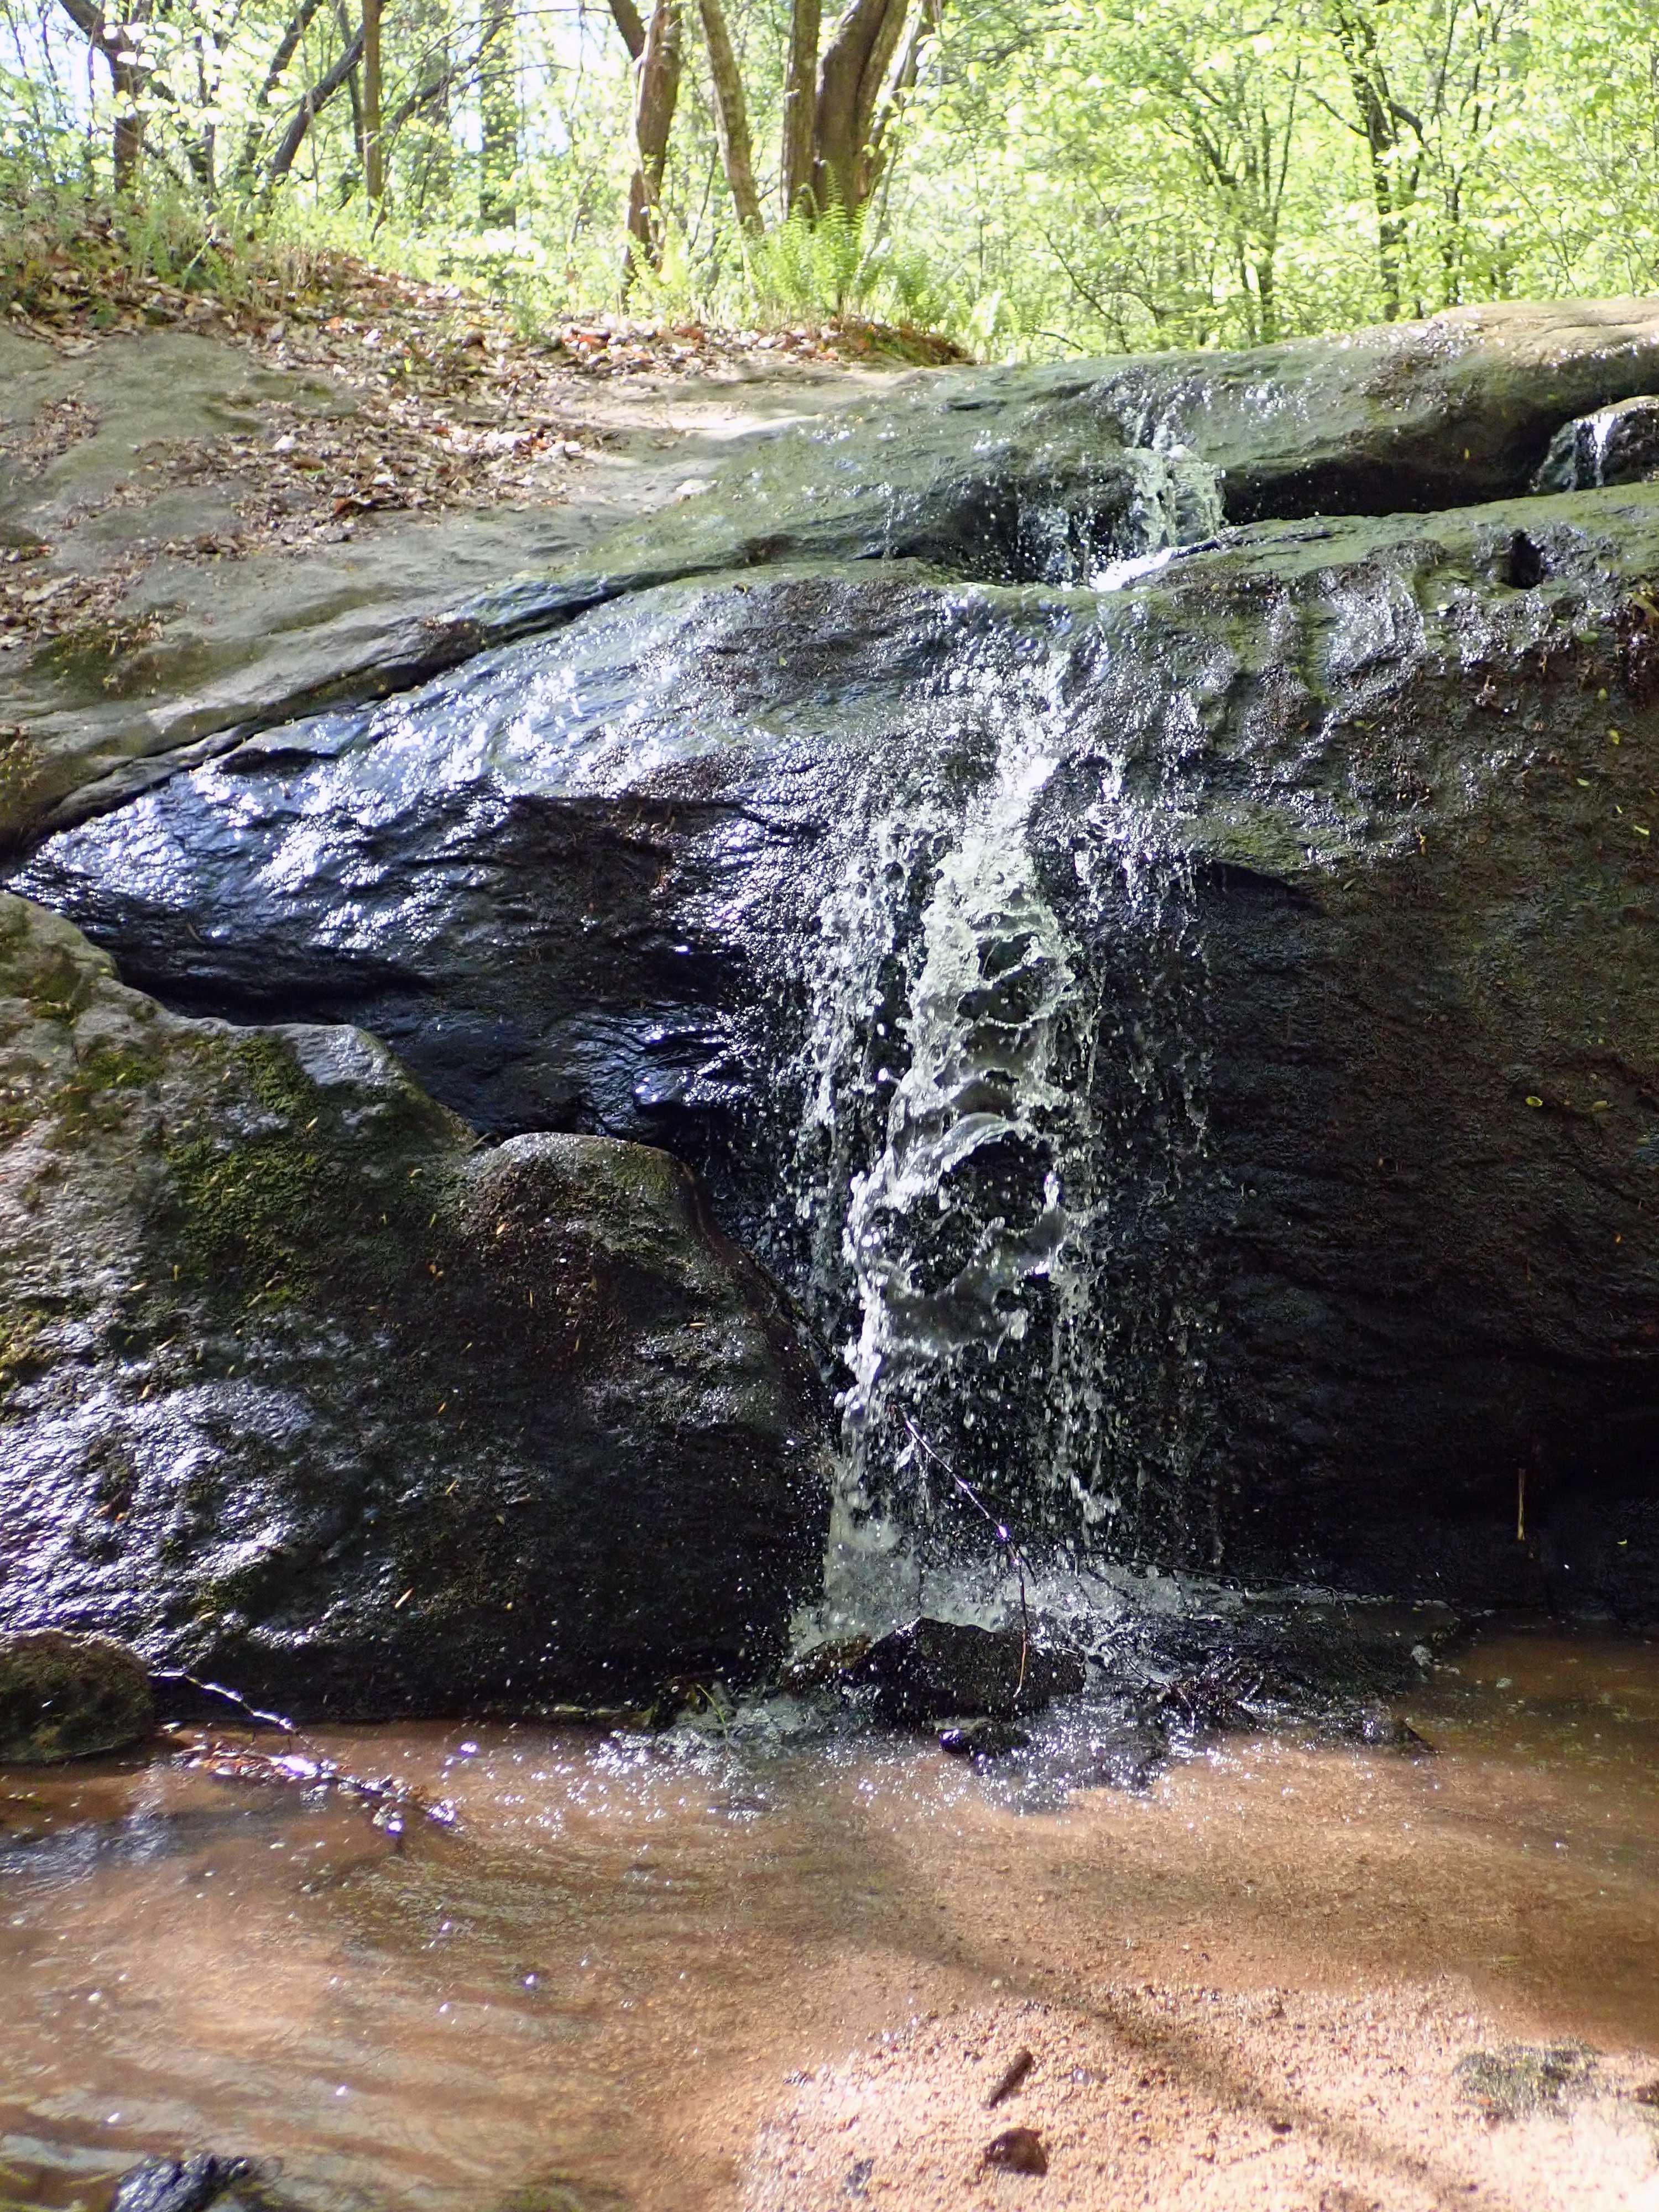 Small waterfall over rock outcrop in Dehart Botanical Gardens